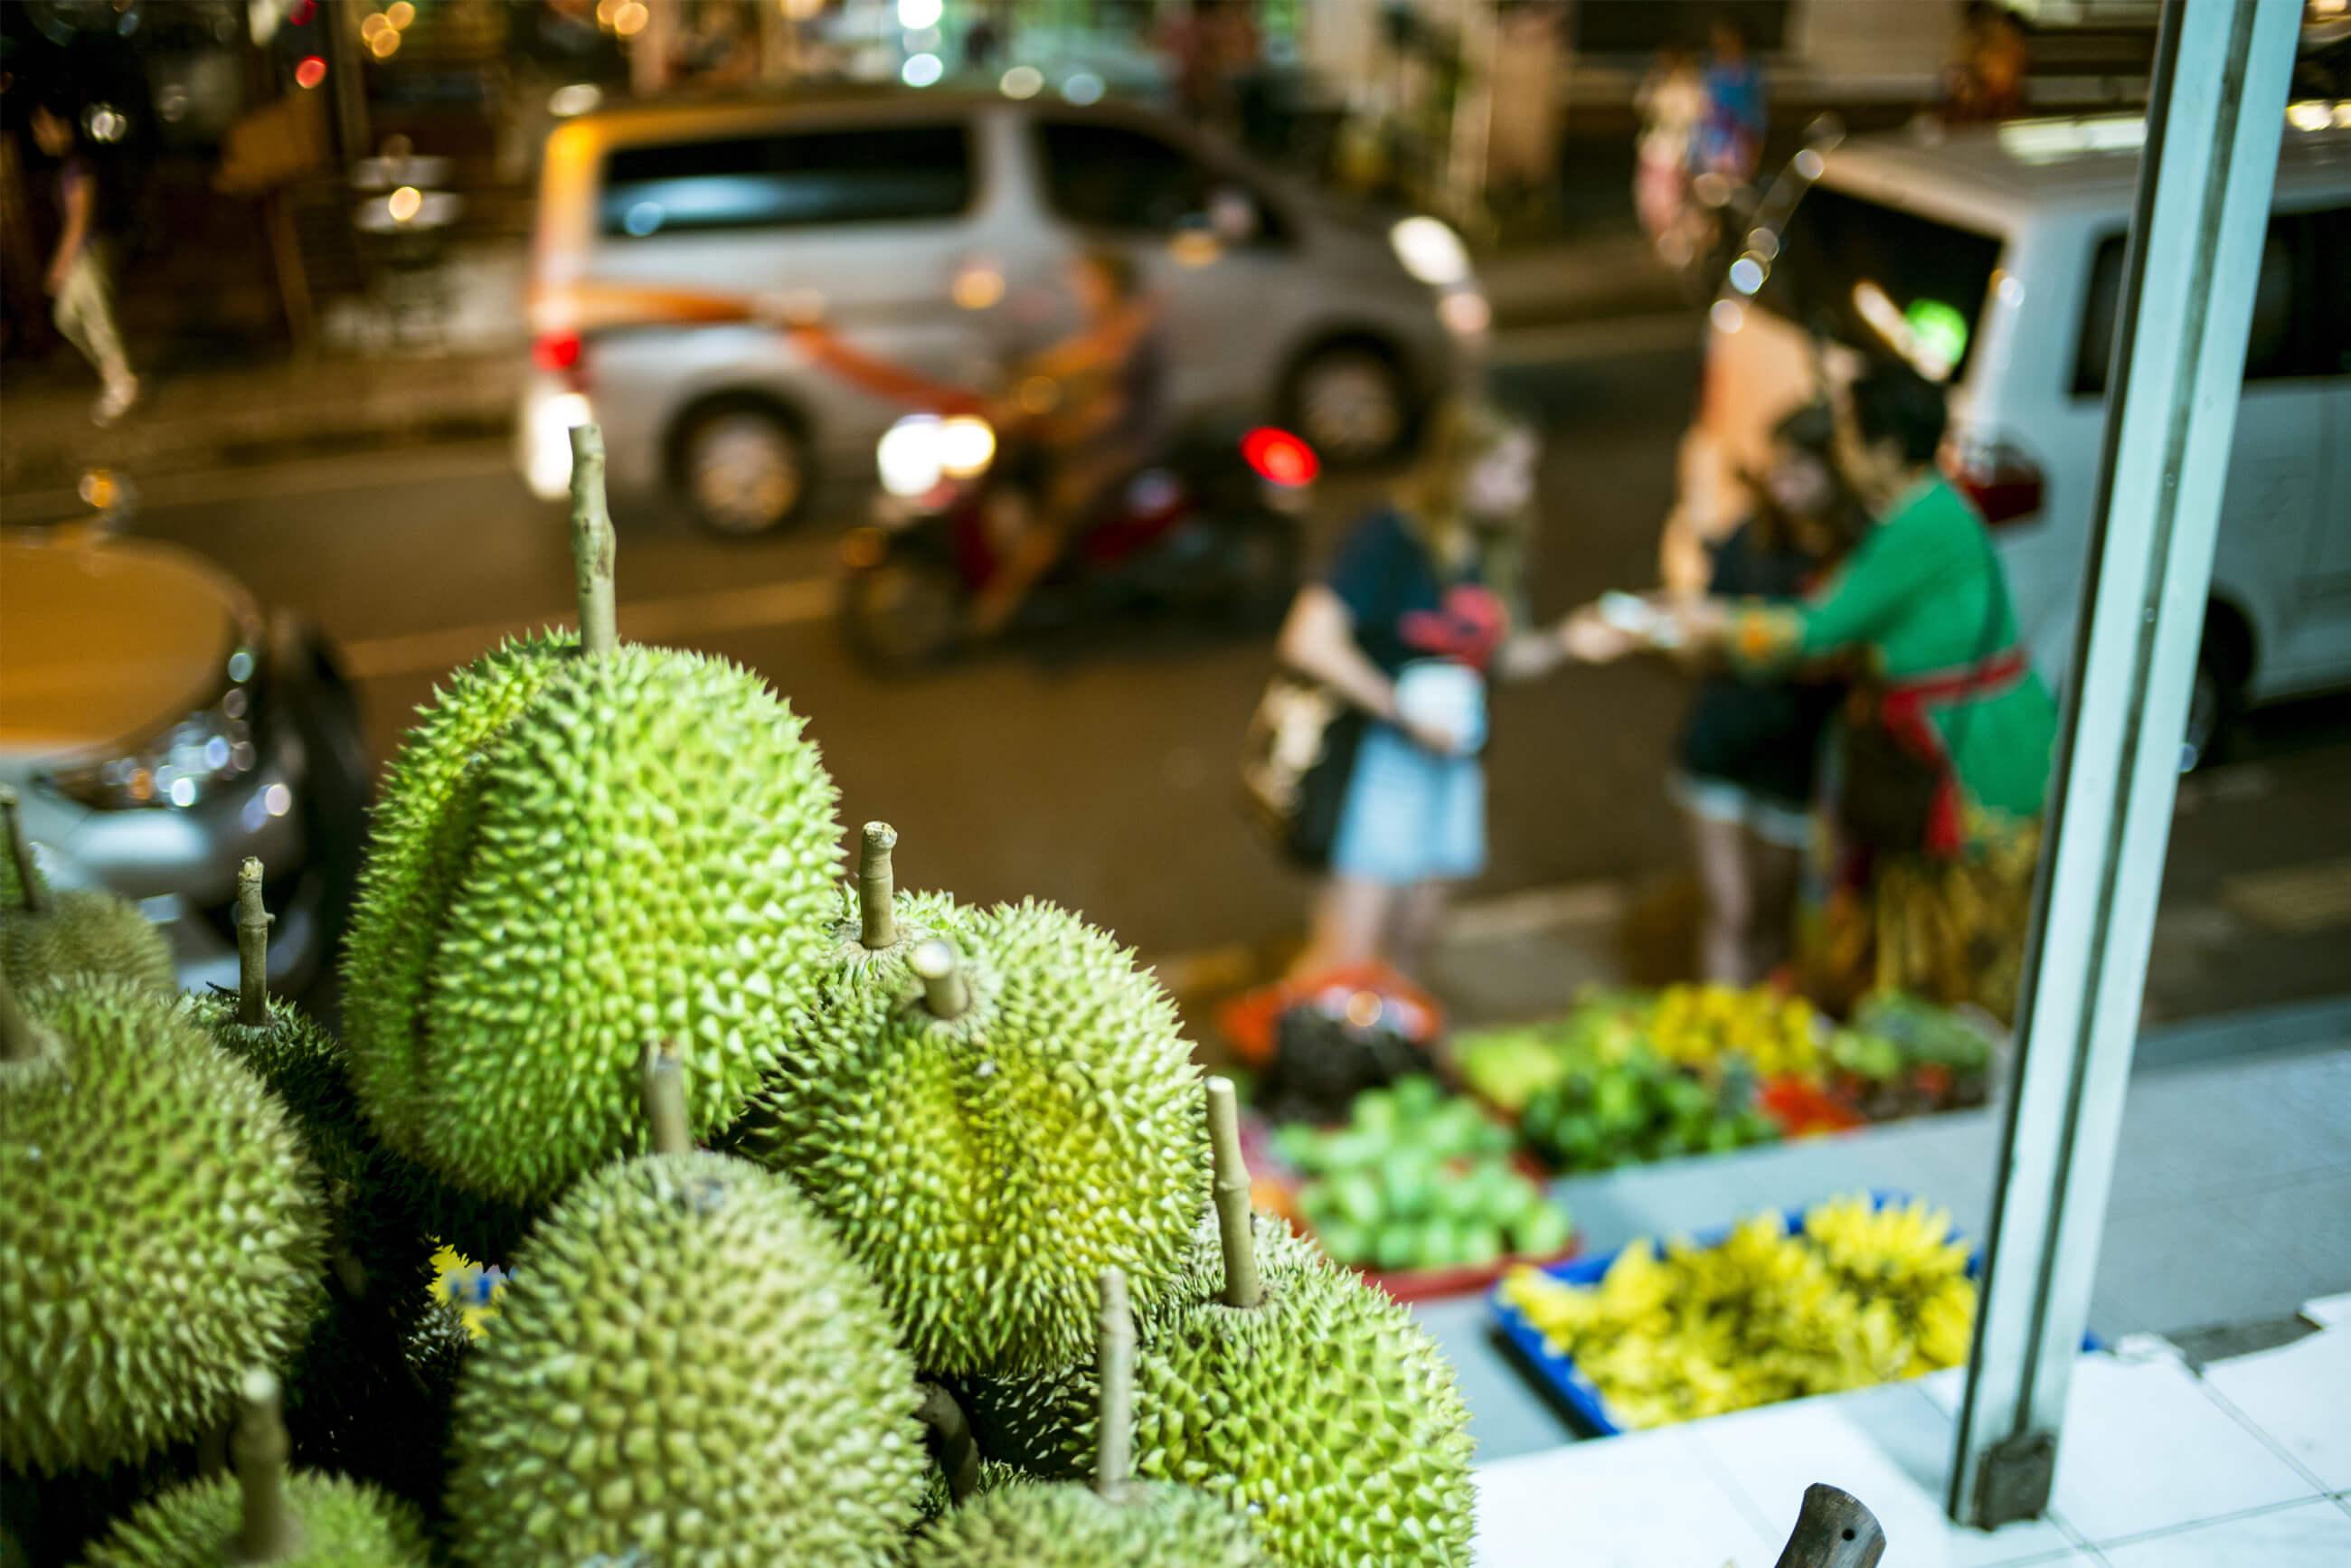 https://bubo.sk/uploads/galleries/7417/lubosfellner_indonezia_bali_durian.jpg